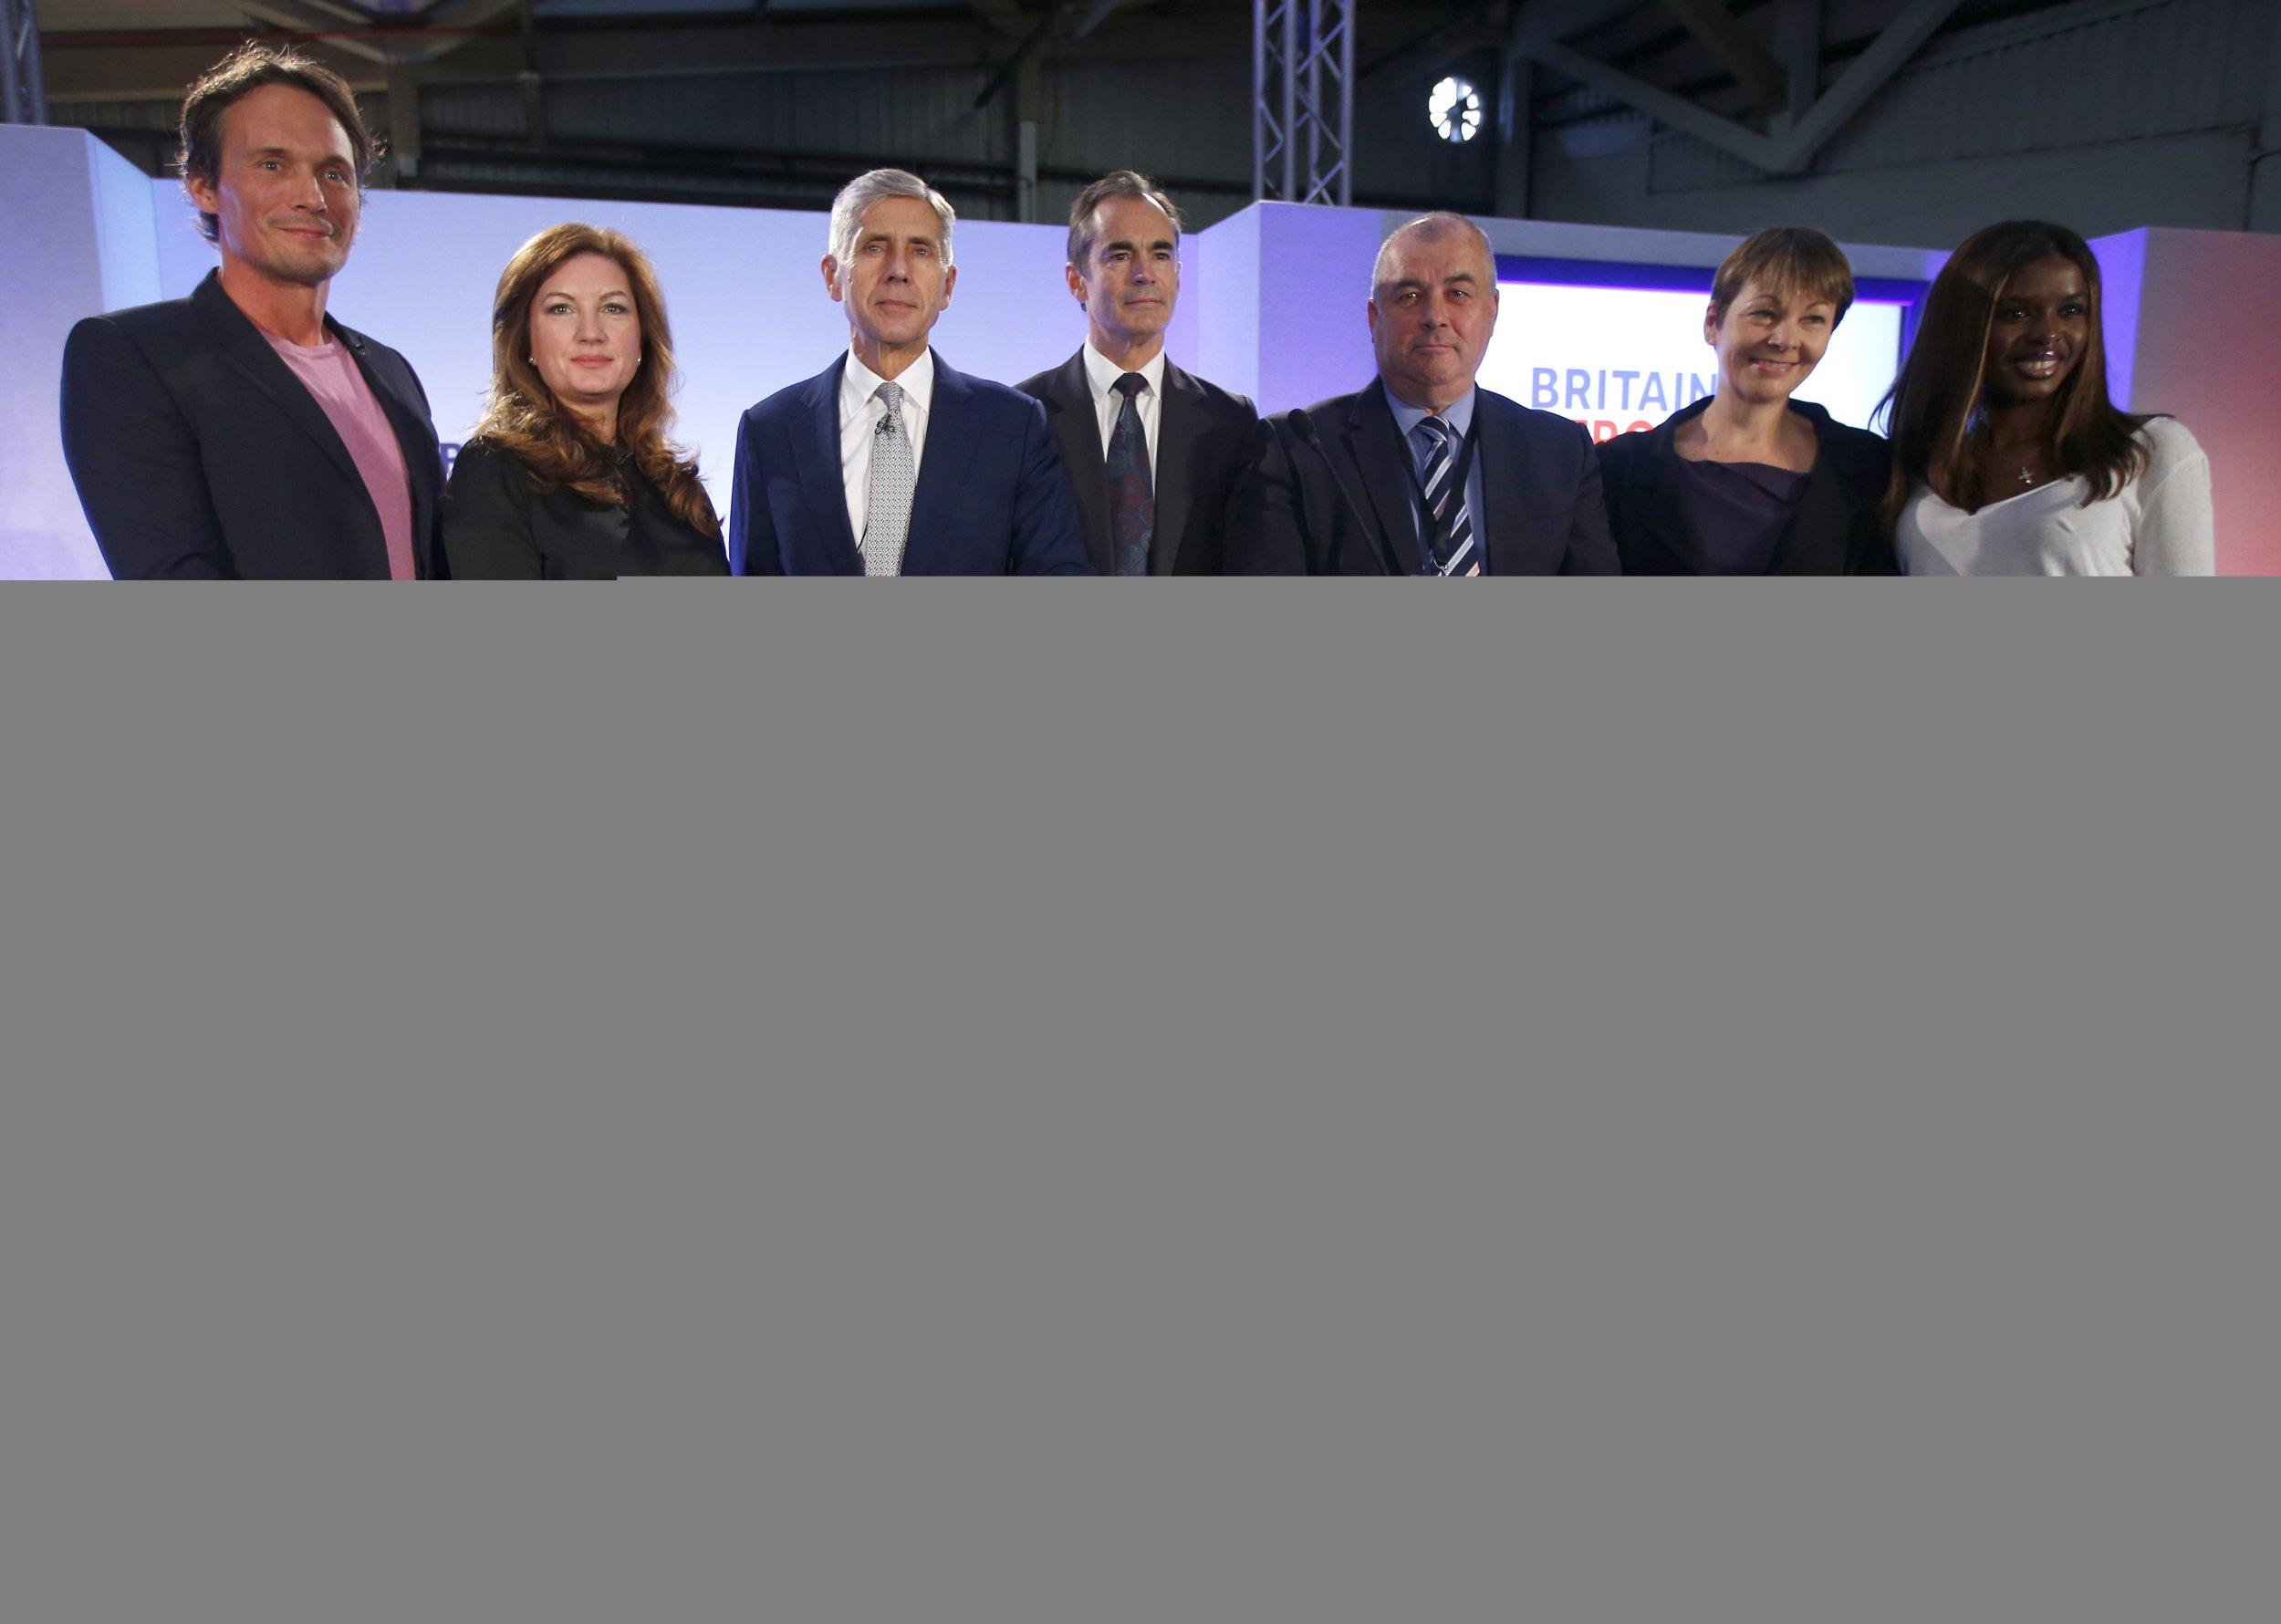 Britain Stronger in Europe Organizers